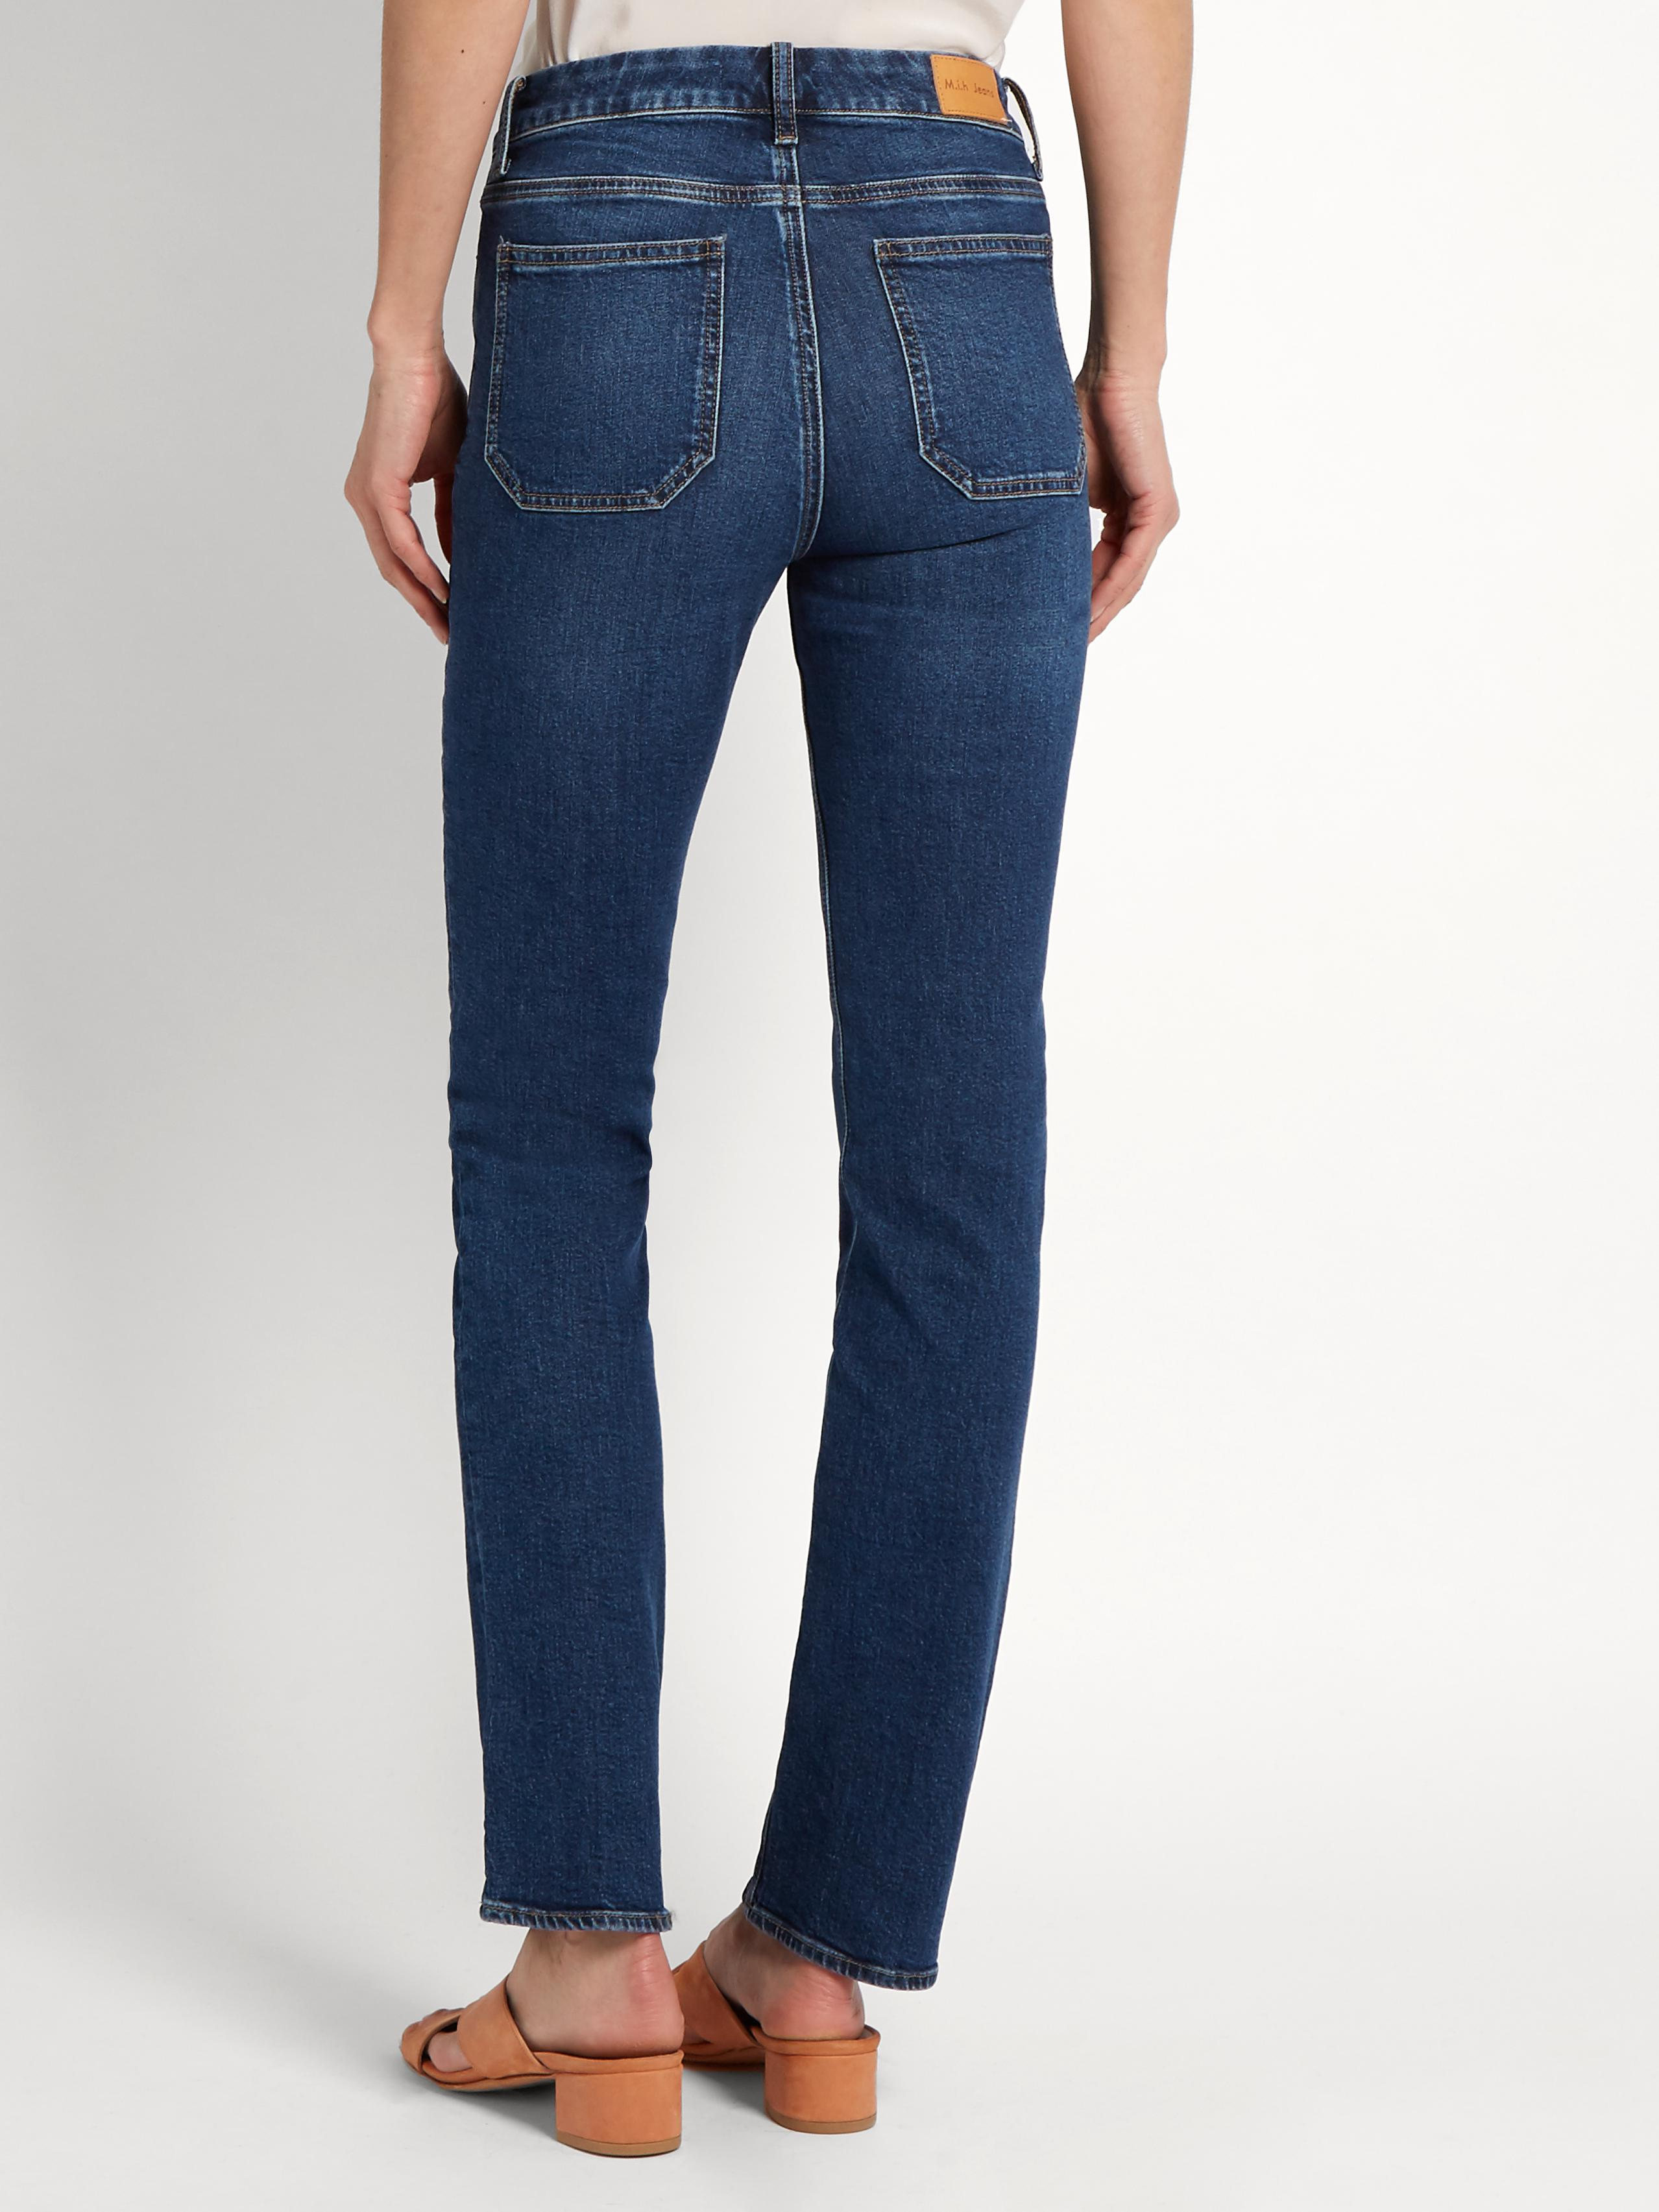 M.i.h Jeans Denim Daily High-rise Straight-leg Jeans in Dark Denim (Blue)